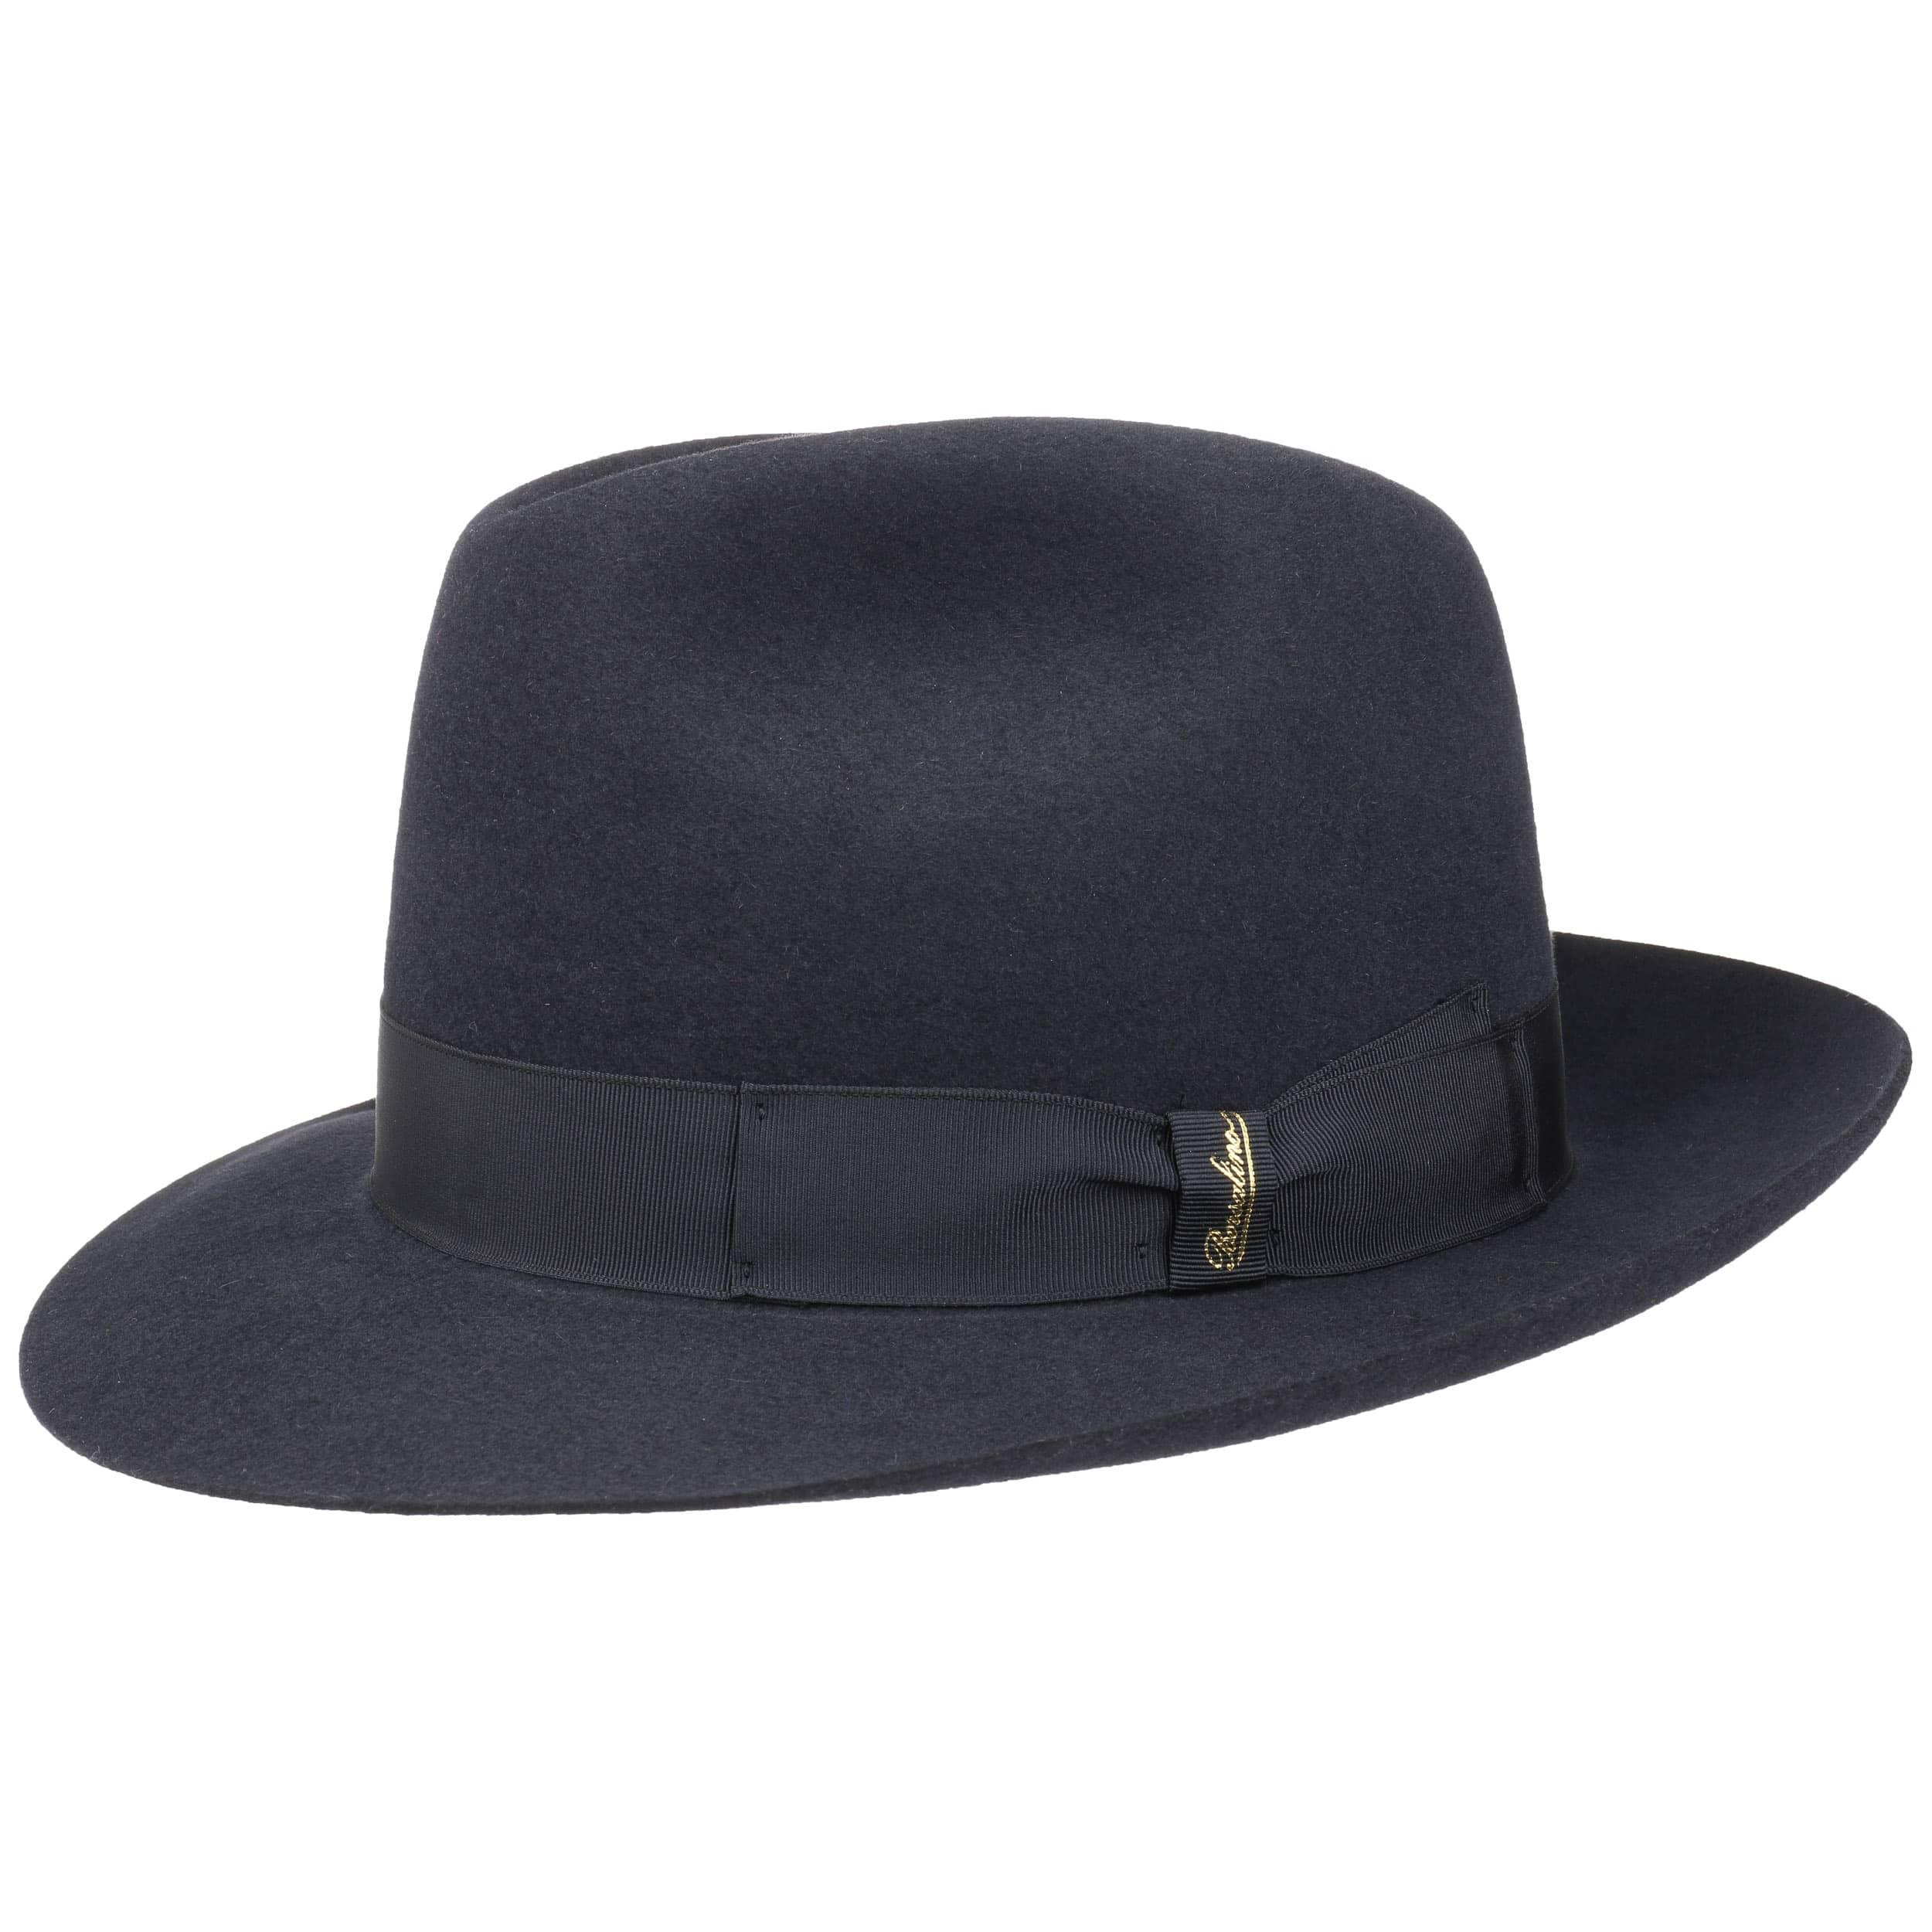 ... Cappello Bogart Marengo by Borsalino - blu 5 cf7607fd0ef0